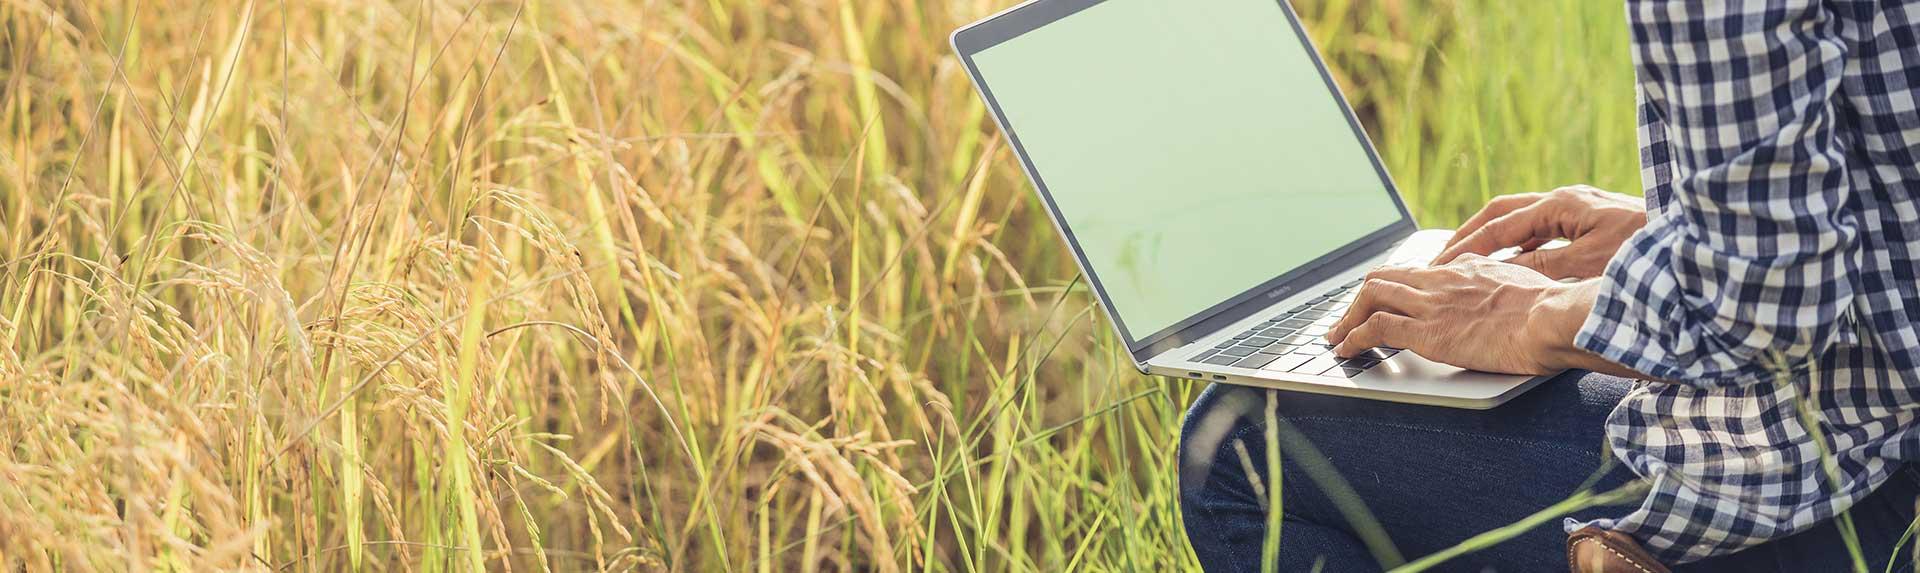 agricultor-tecnologia